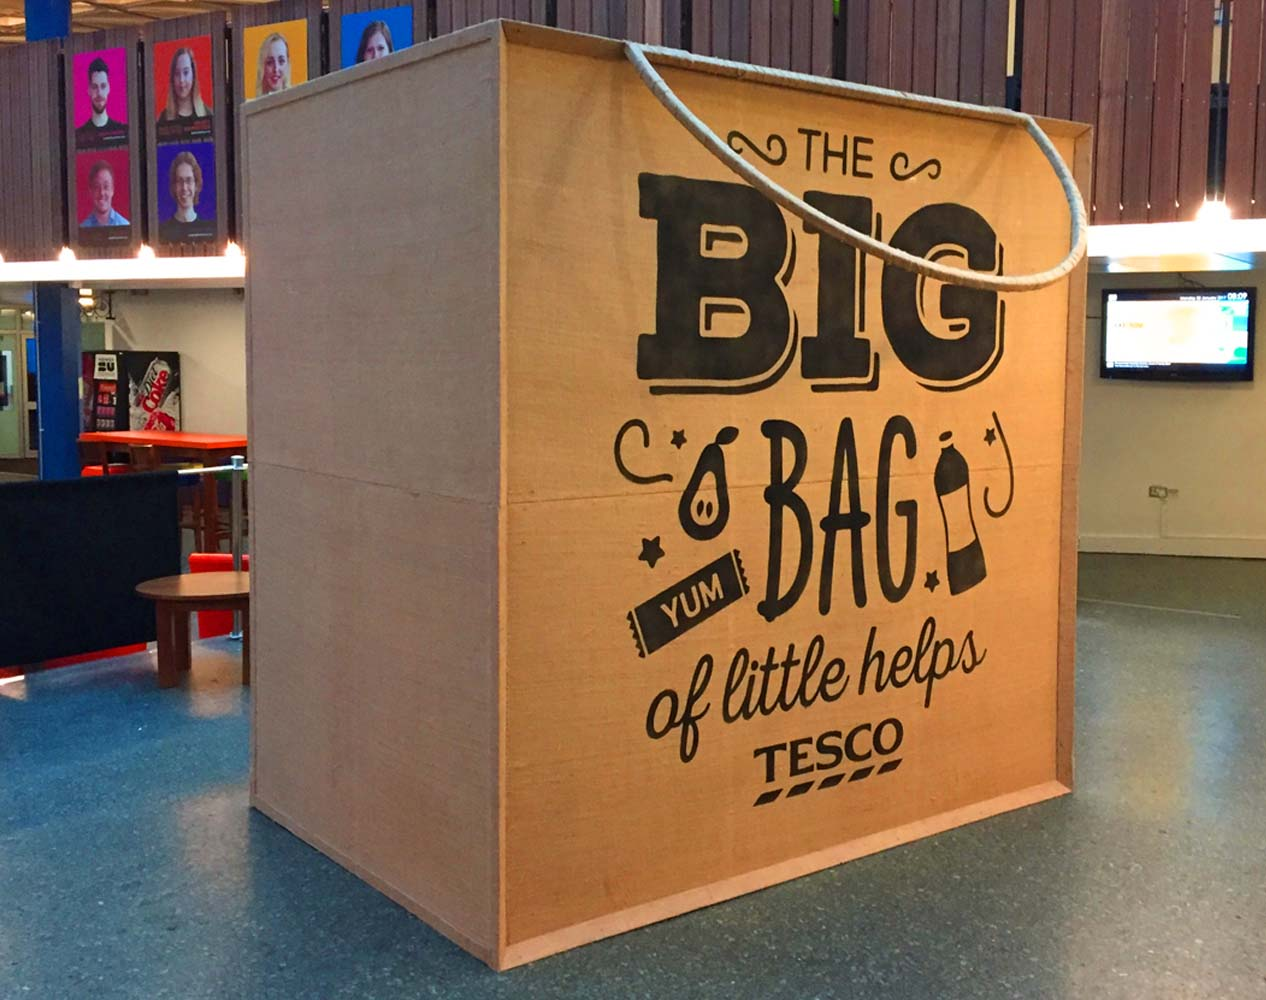 tesco giant shopping bag